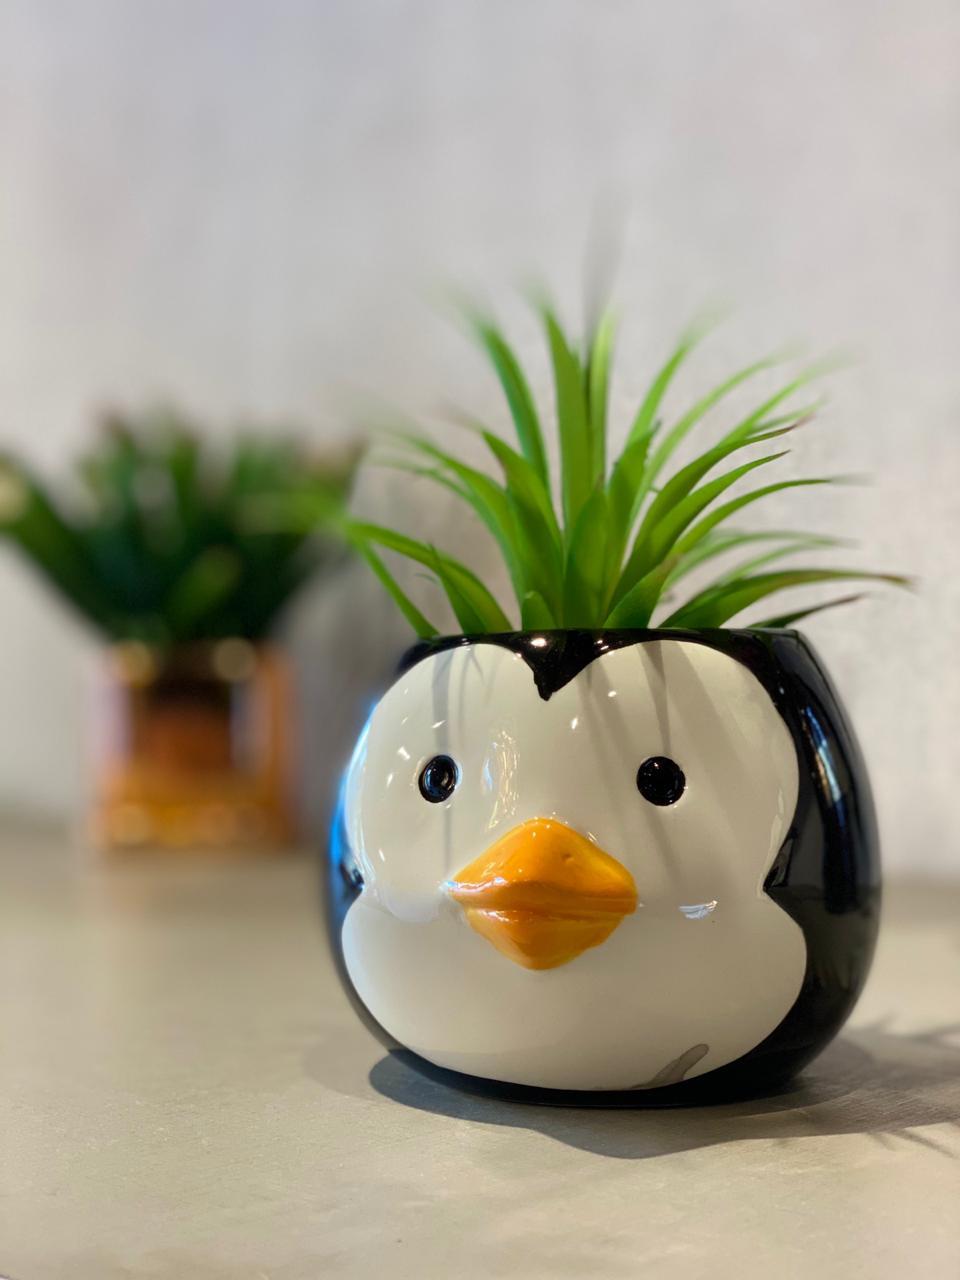 Vaso Decorativo Pets Colection: Pinguim - La Fleur